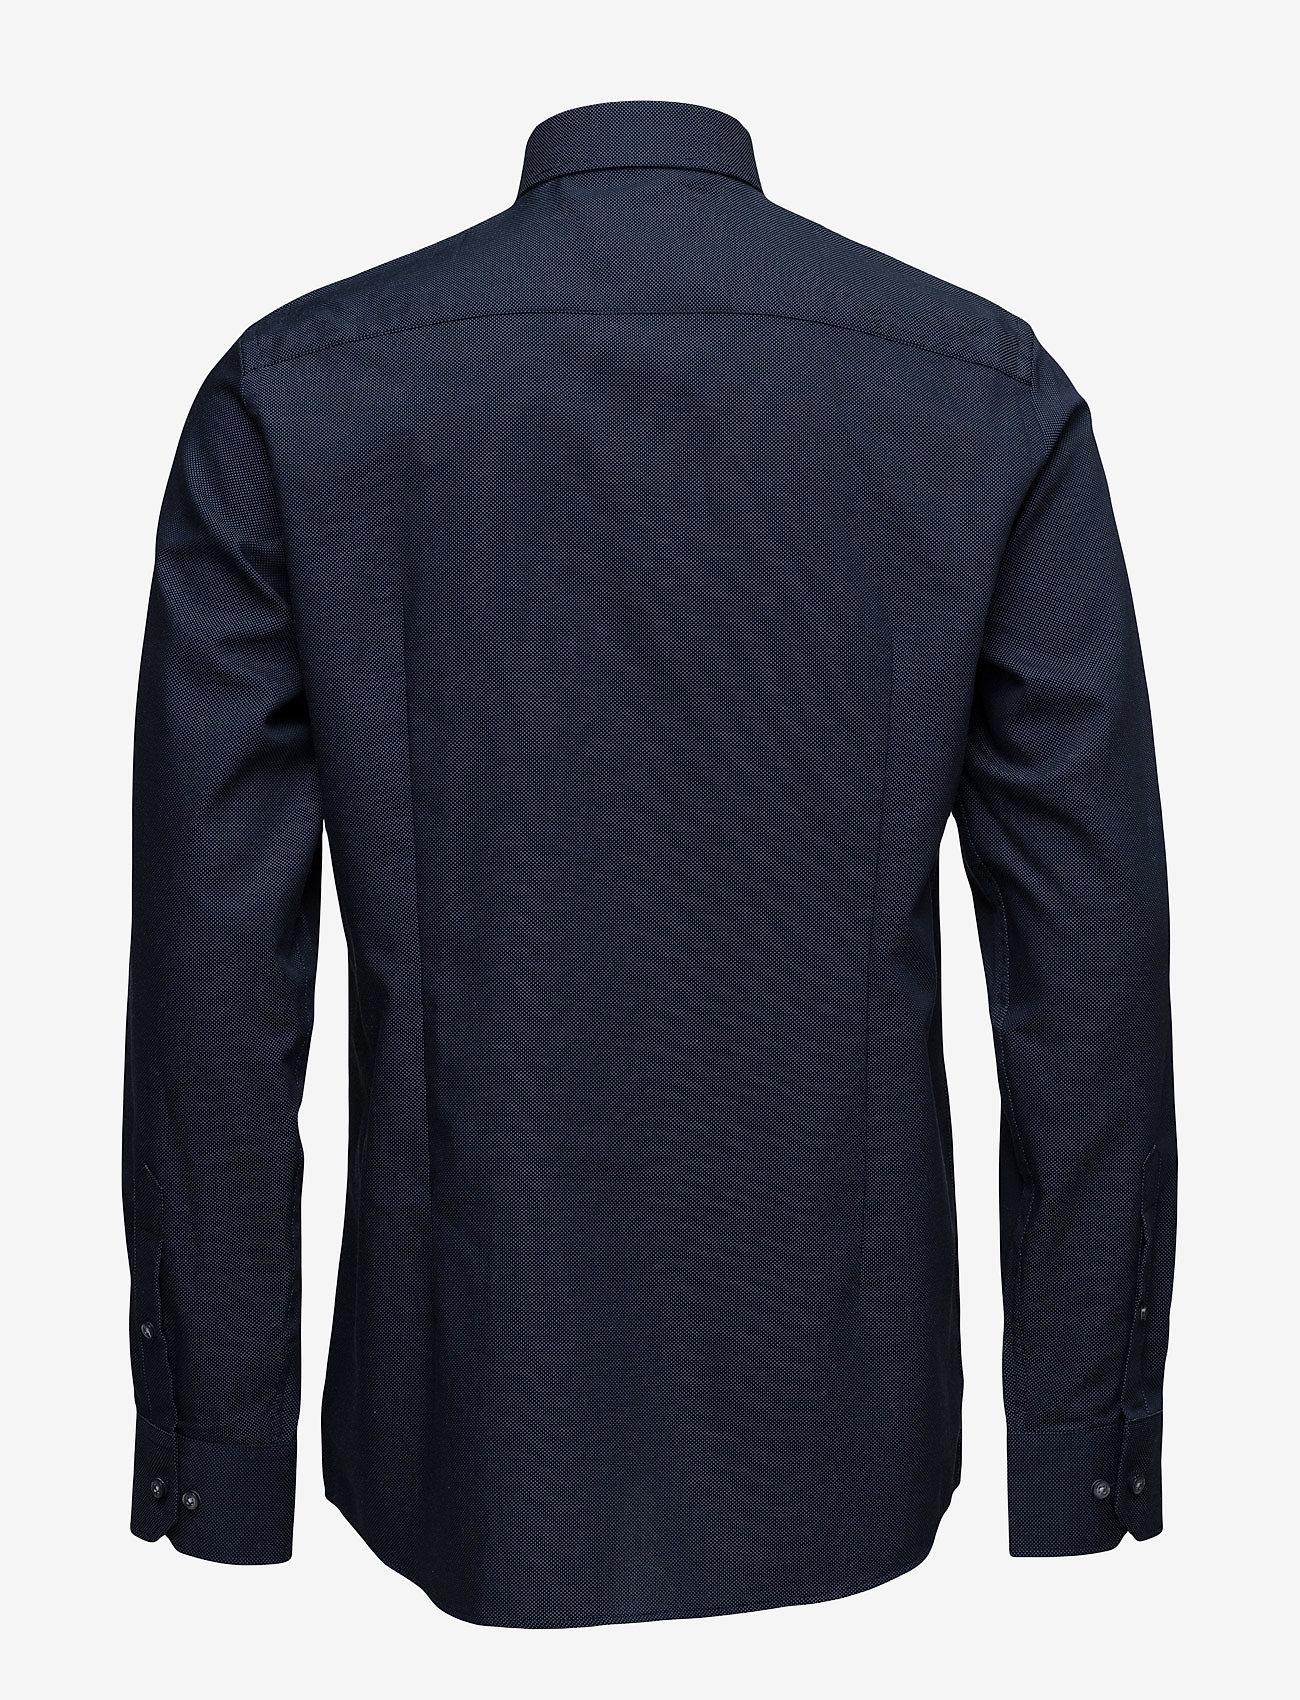 Bruun & Stengade Logan - Skjorter NAVY CUTAWAY - Menn Klær